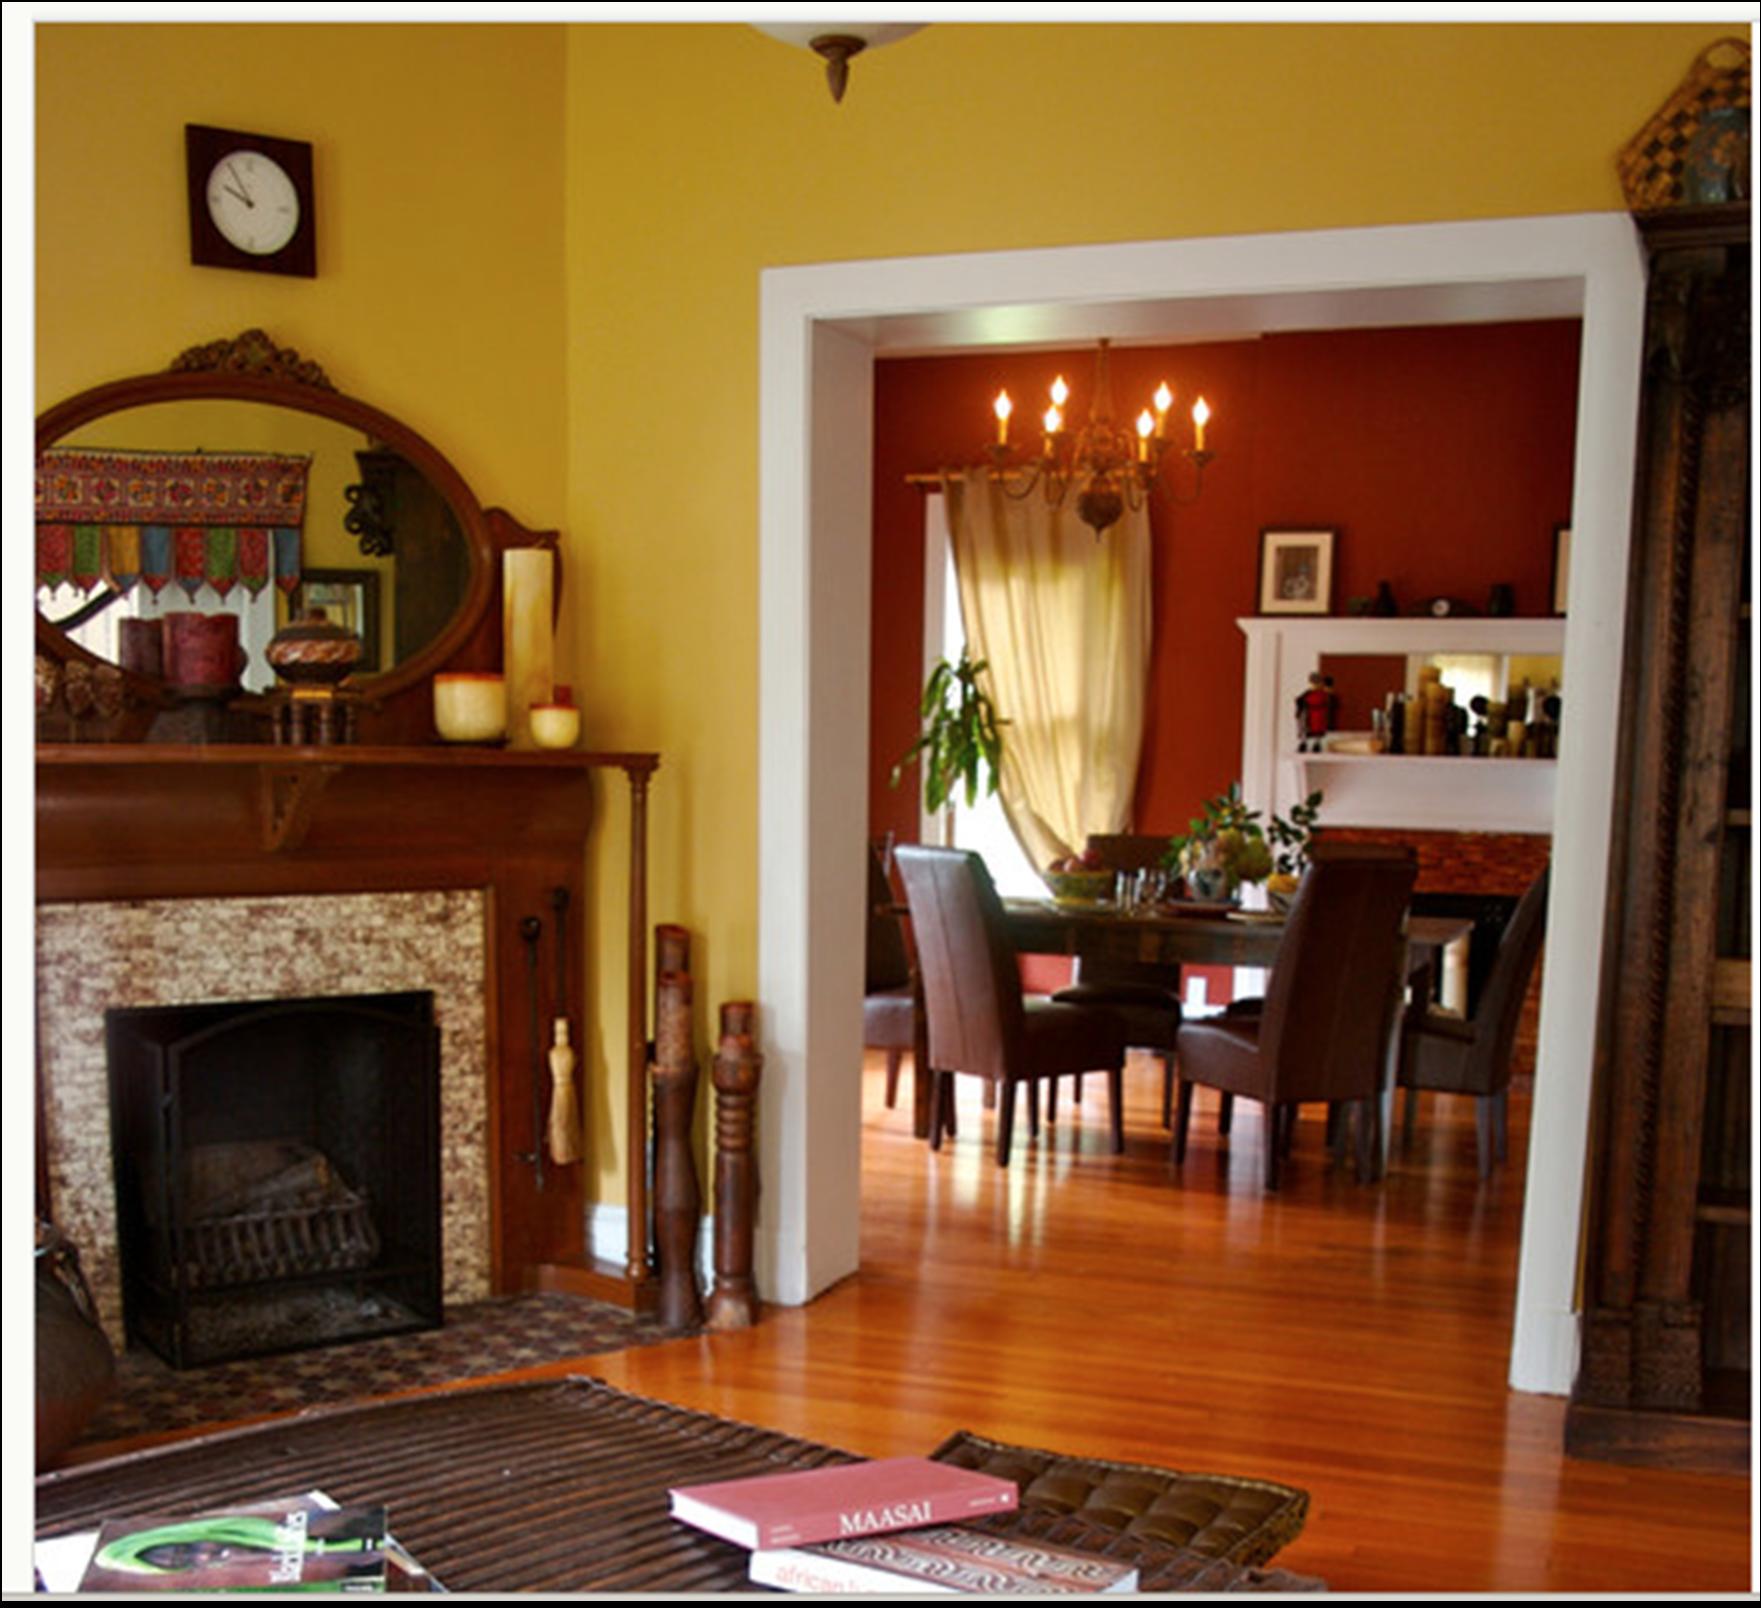 Decor 12 Traditional bedroom decor, Tropical living room